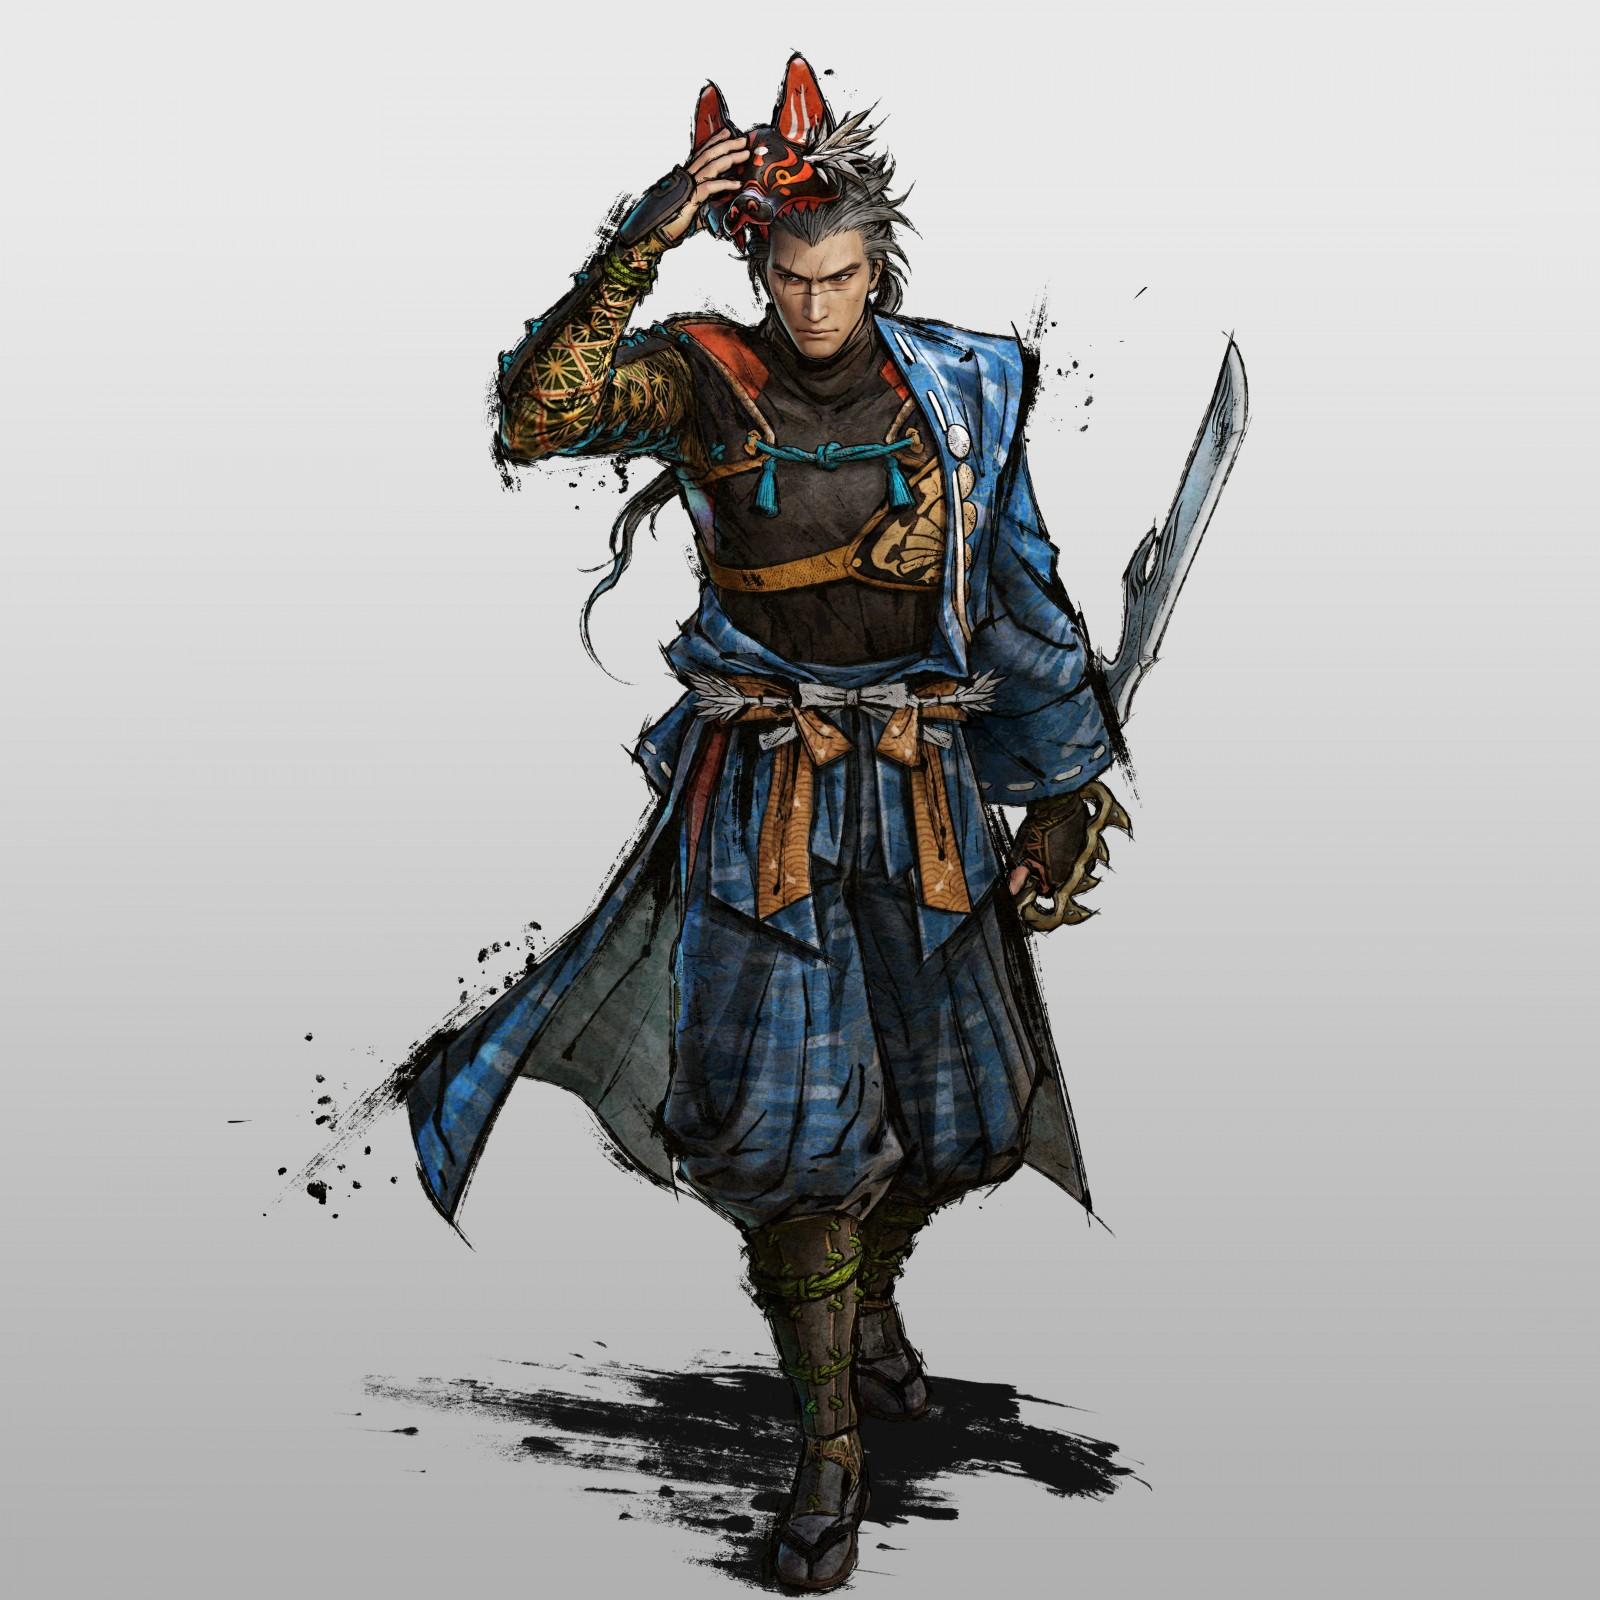 Reseña: Samurai Warriors 5 4